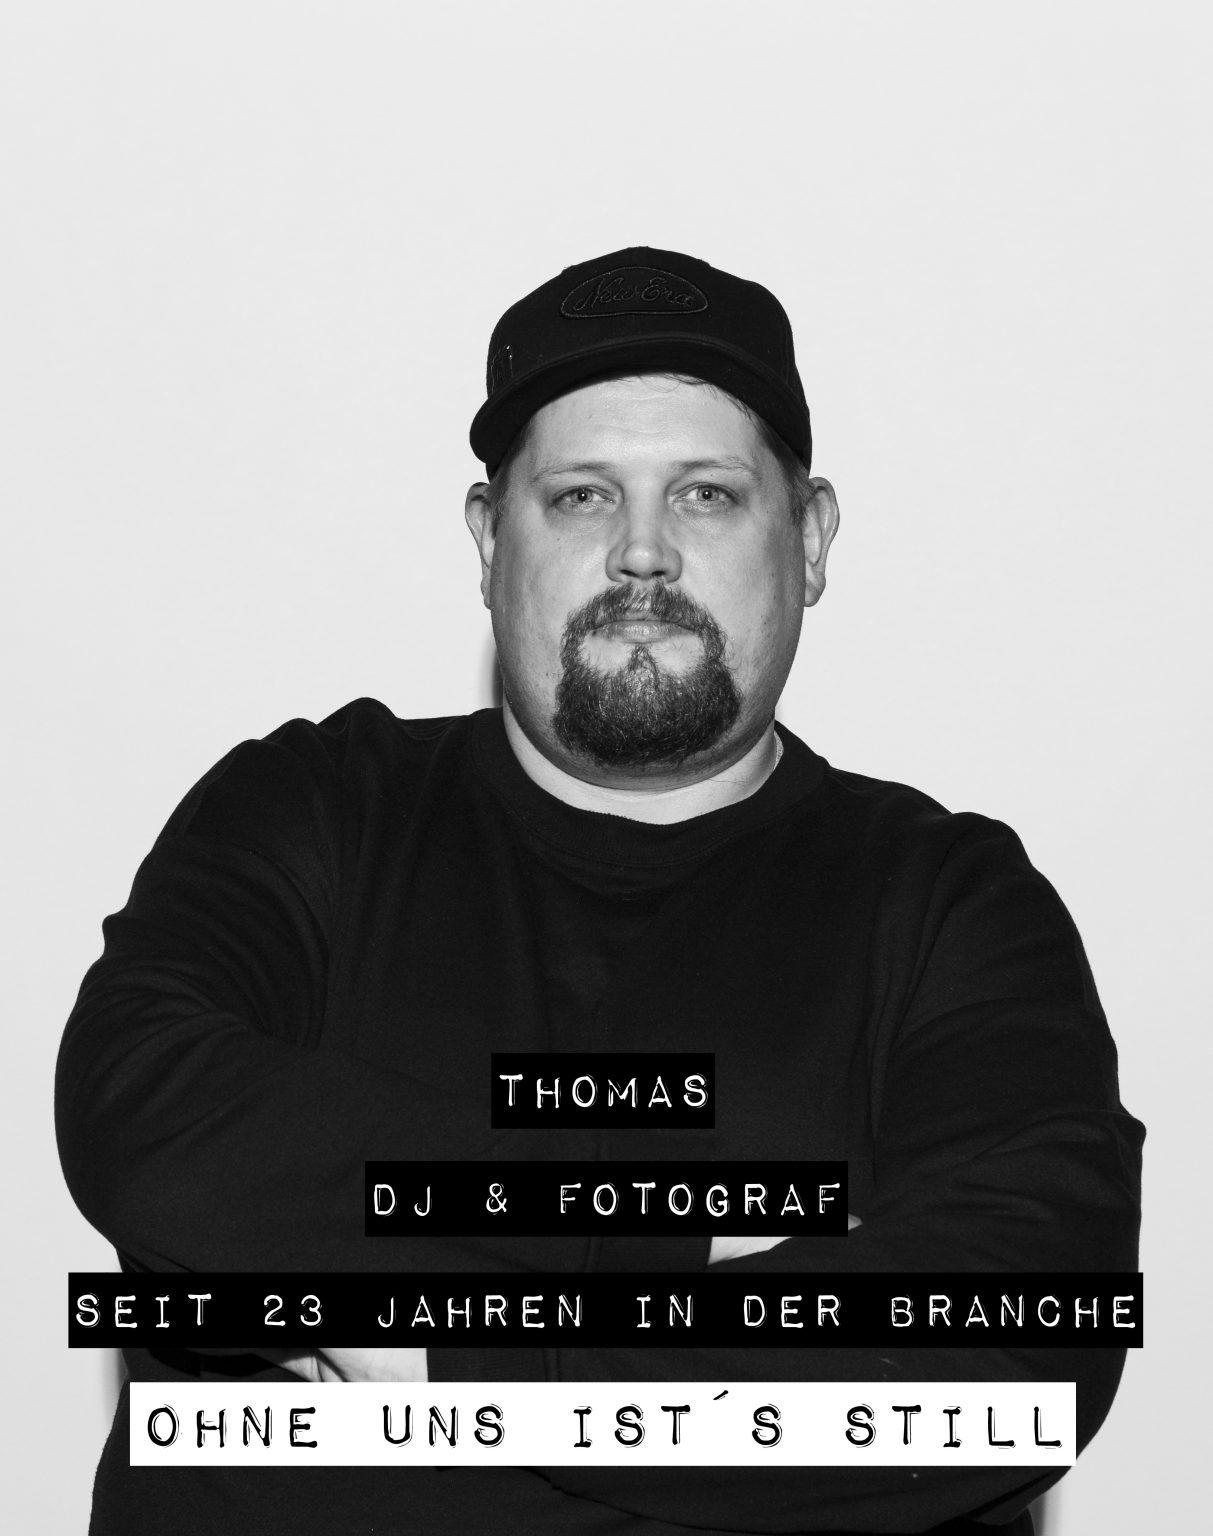 Thomas Sch